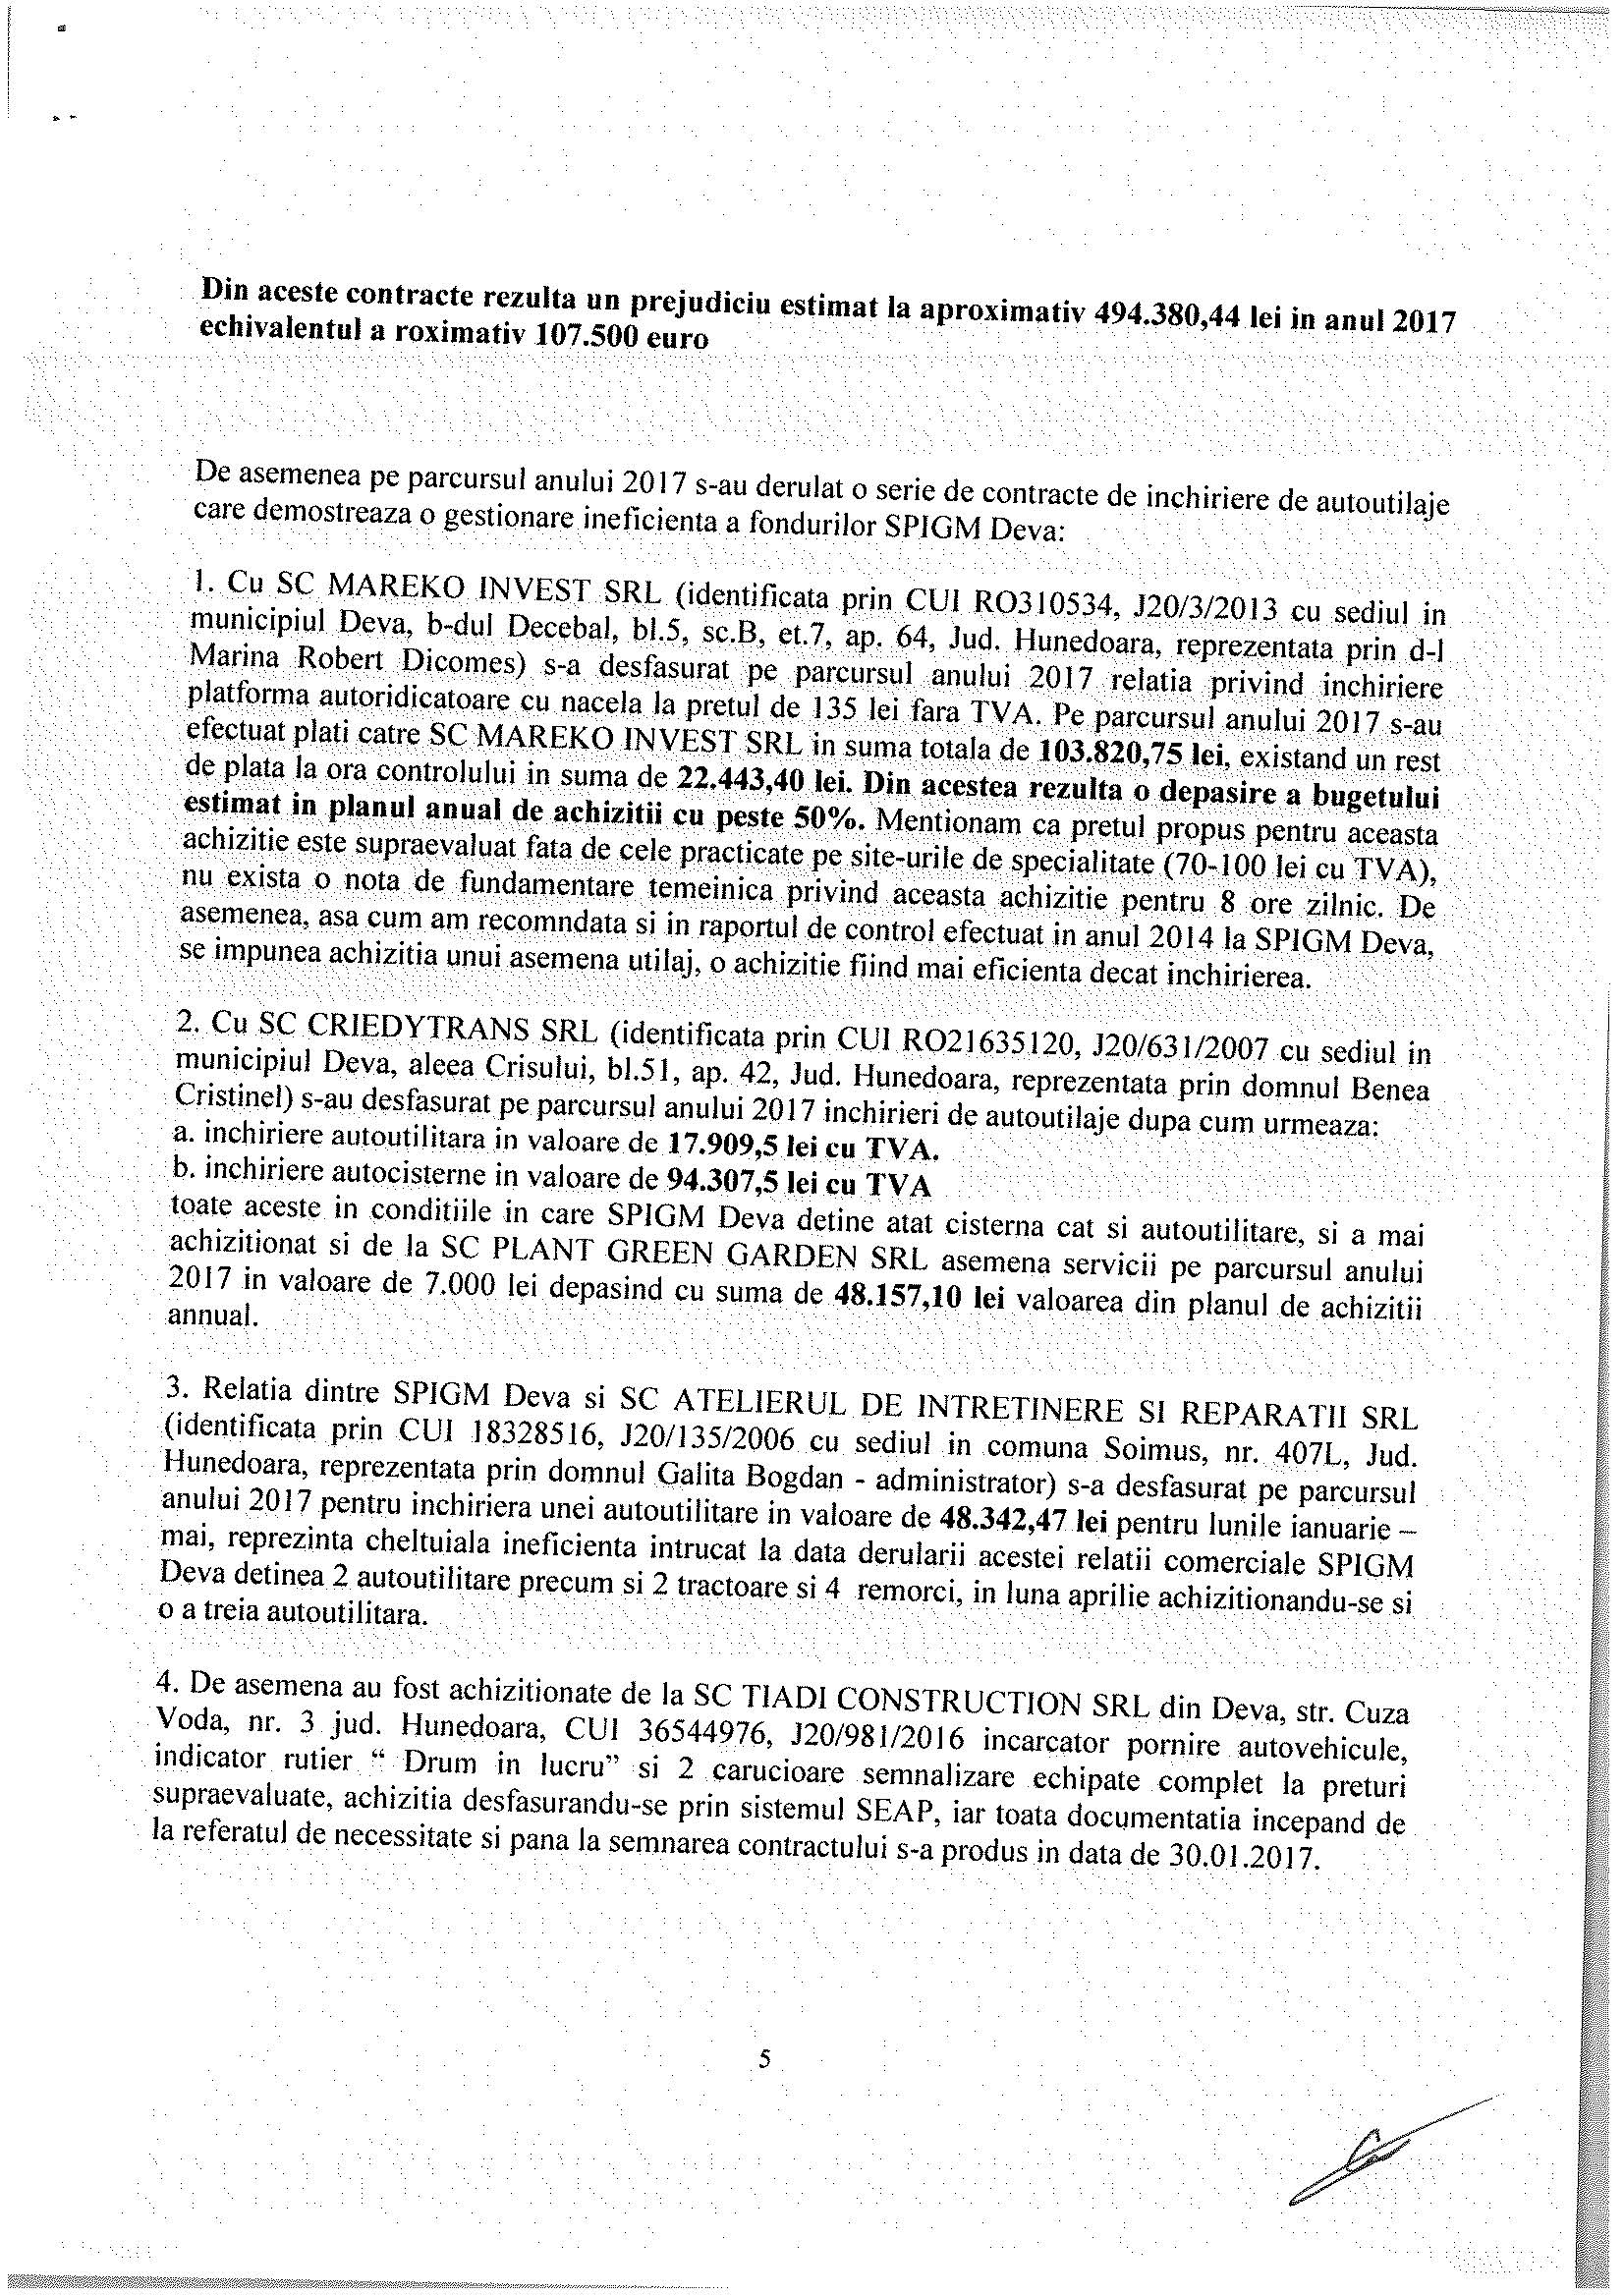 I-concluzii raport_Page_5